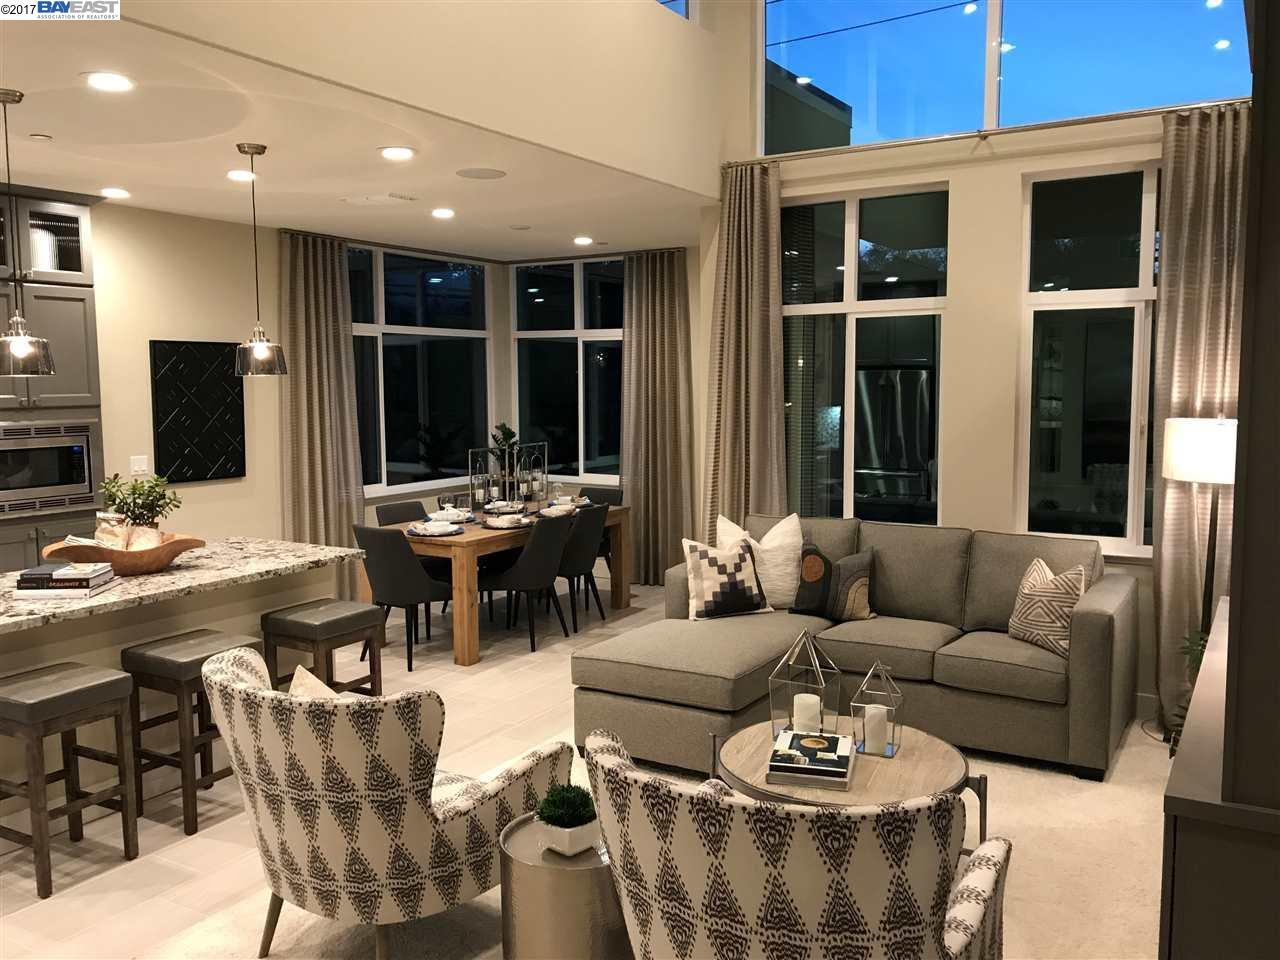 Additional photo for property listing at 305 Stoneyridge Lane 305 Stoneyridge Lane Walnut Creek, California 94596 Estados Unidos